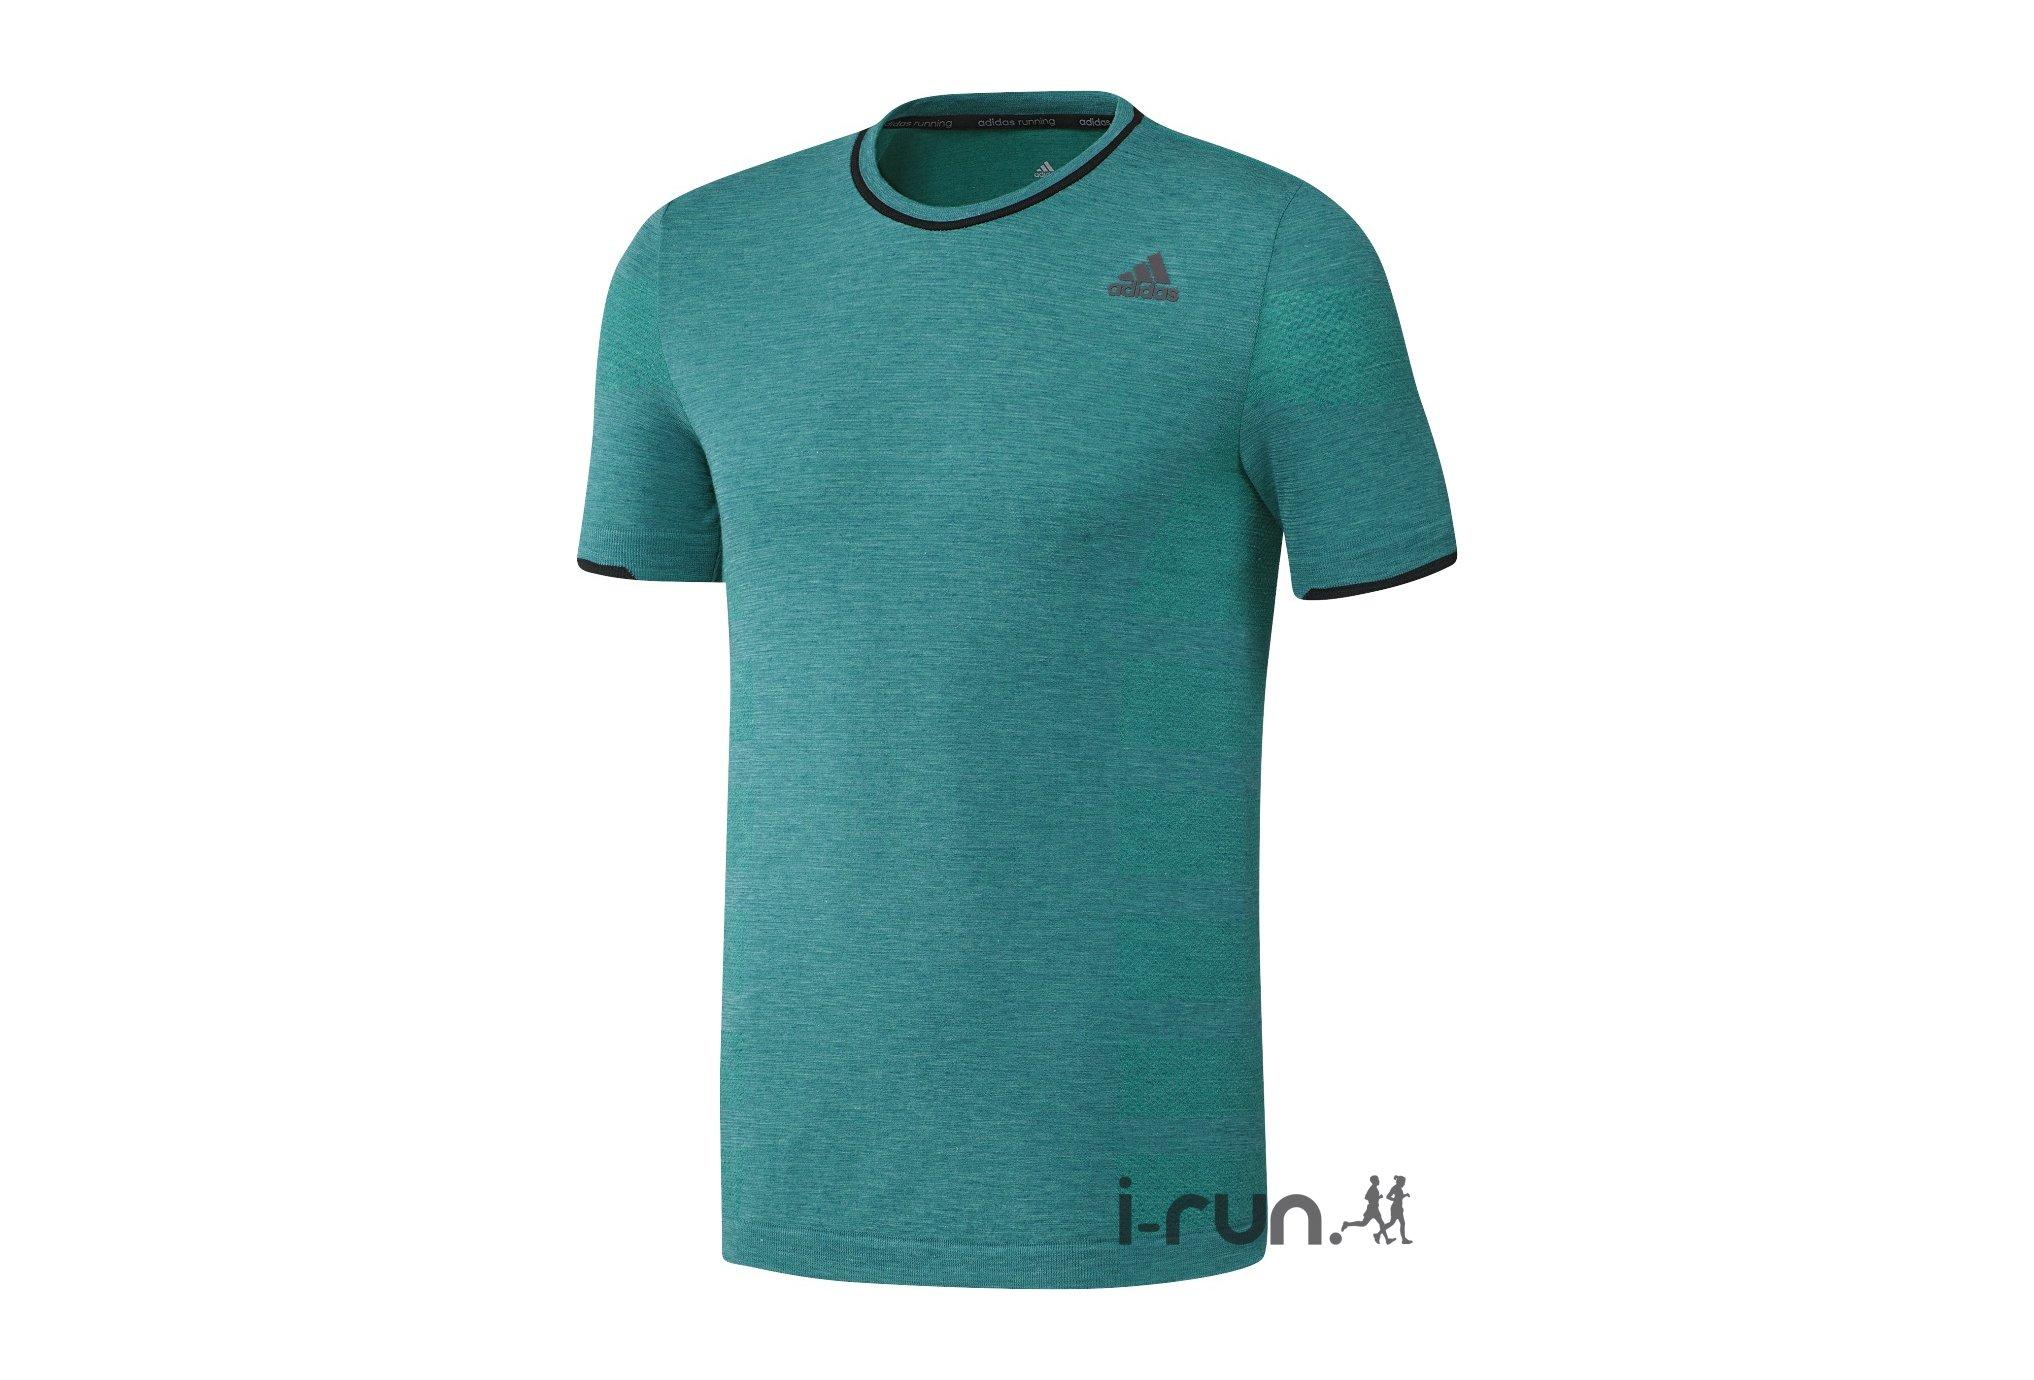 adidas Tee-shirt adistar Primeknit M vêtement running homme